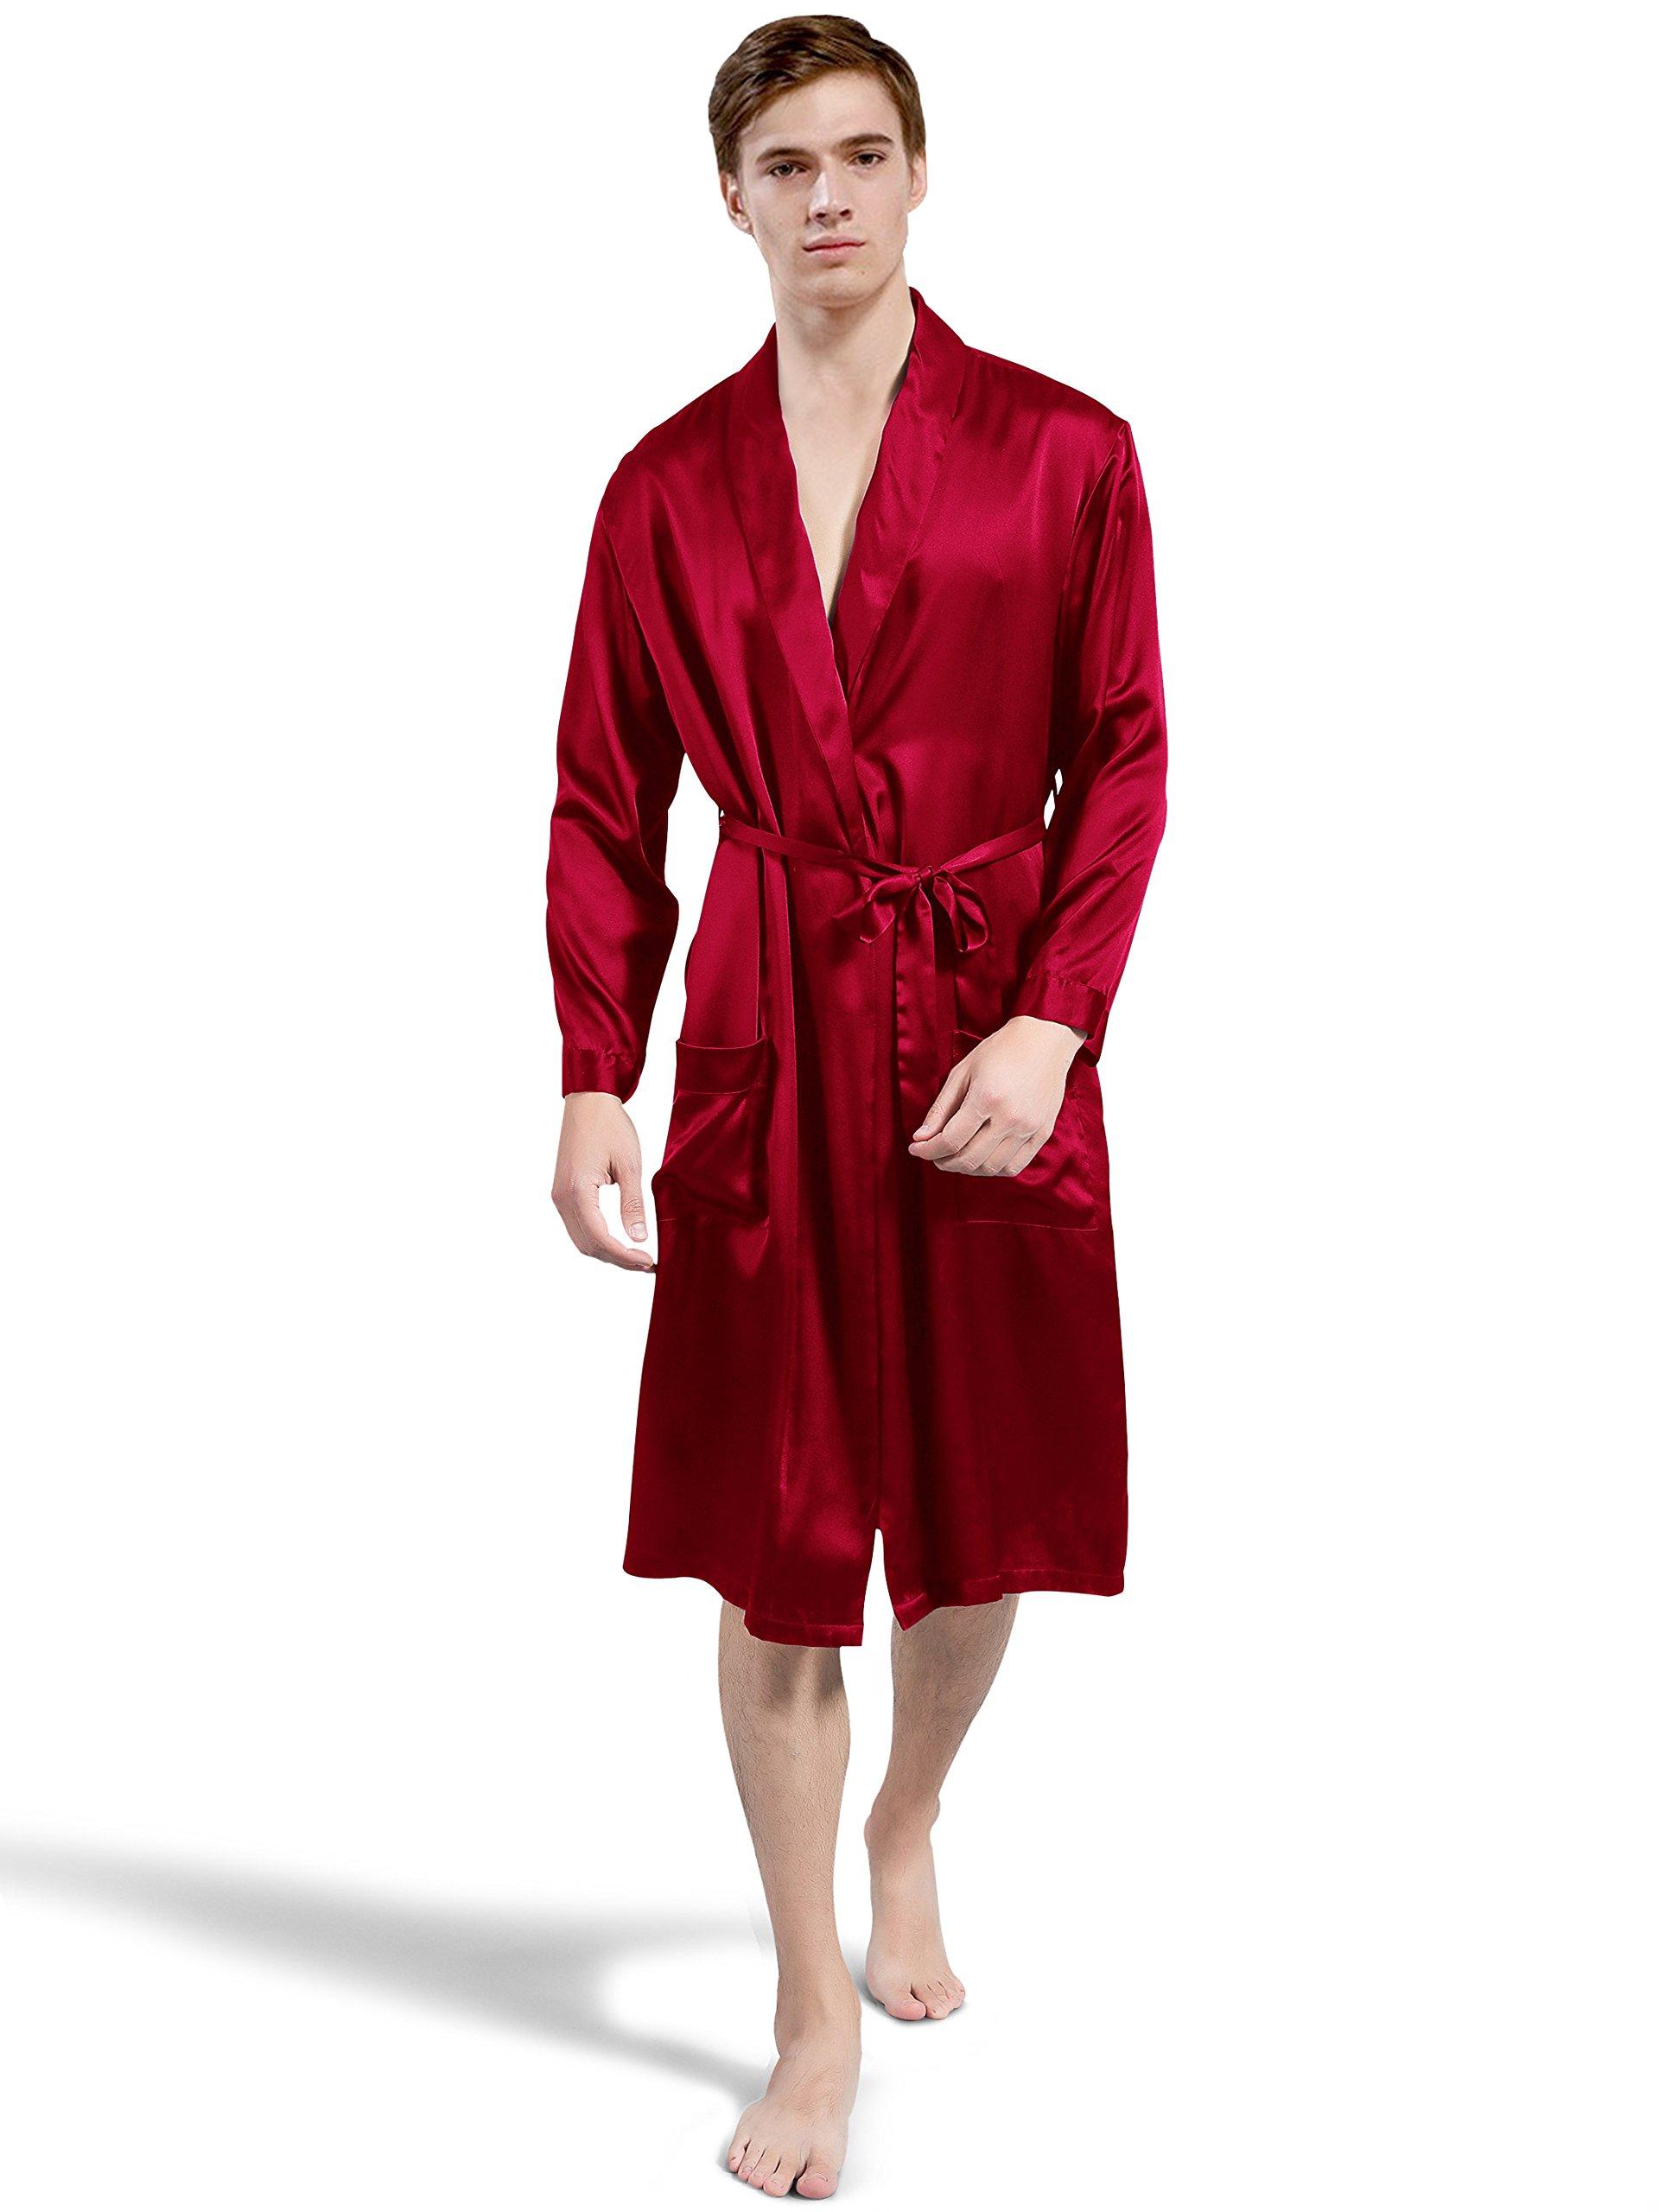 ElleSilk Men's Silk Robe, Silk Sleepwear For Men, 22 Momme 100% Mulberry Silk, Wine, L